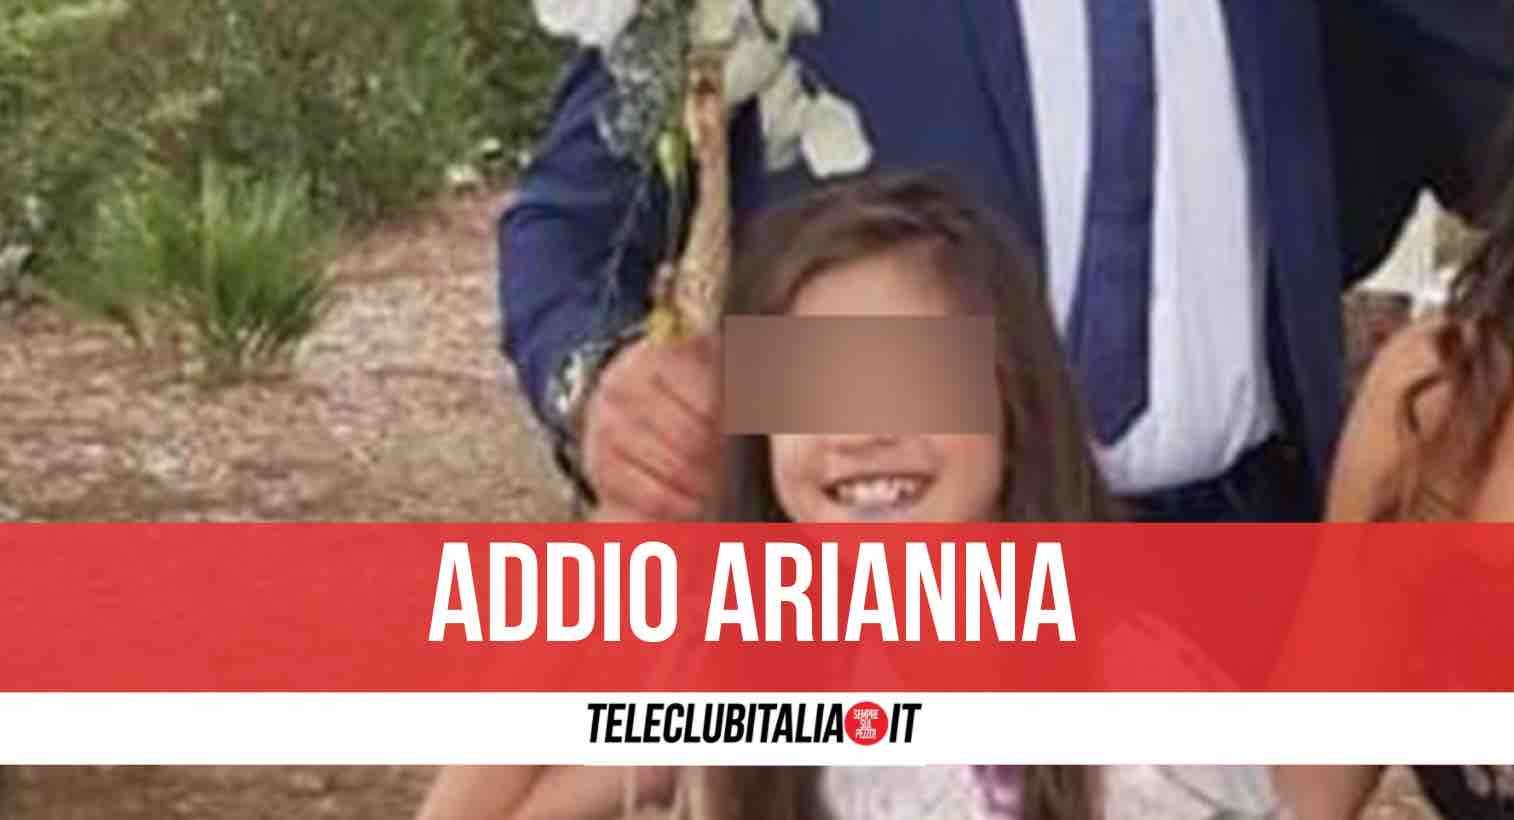 arianna 13 anni muore pfizer